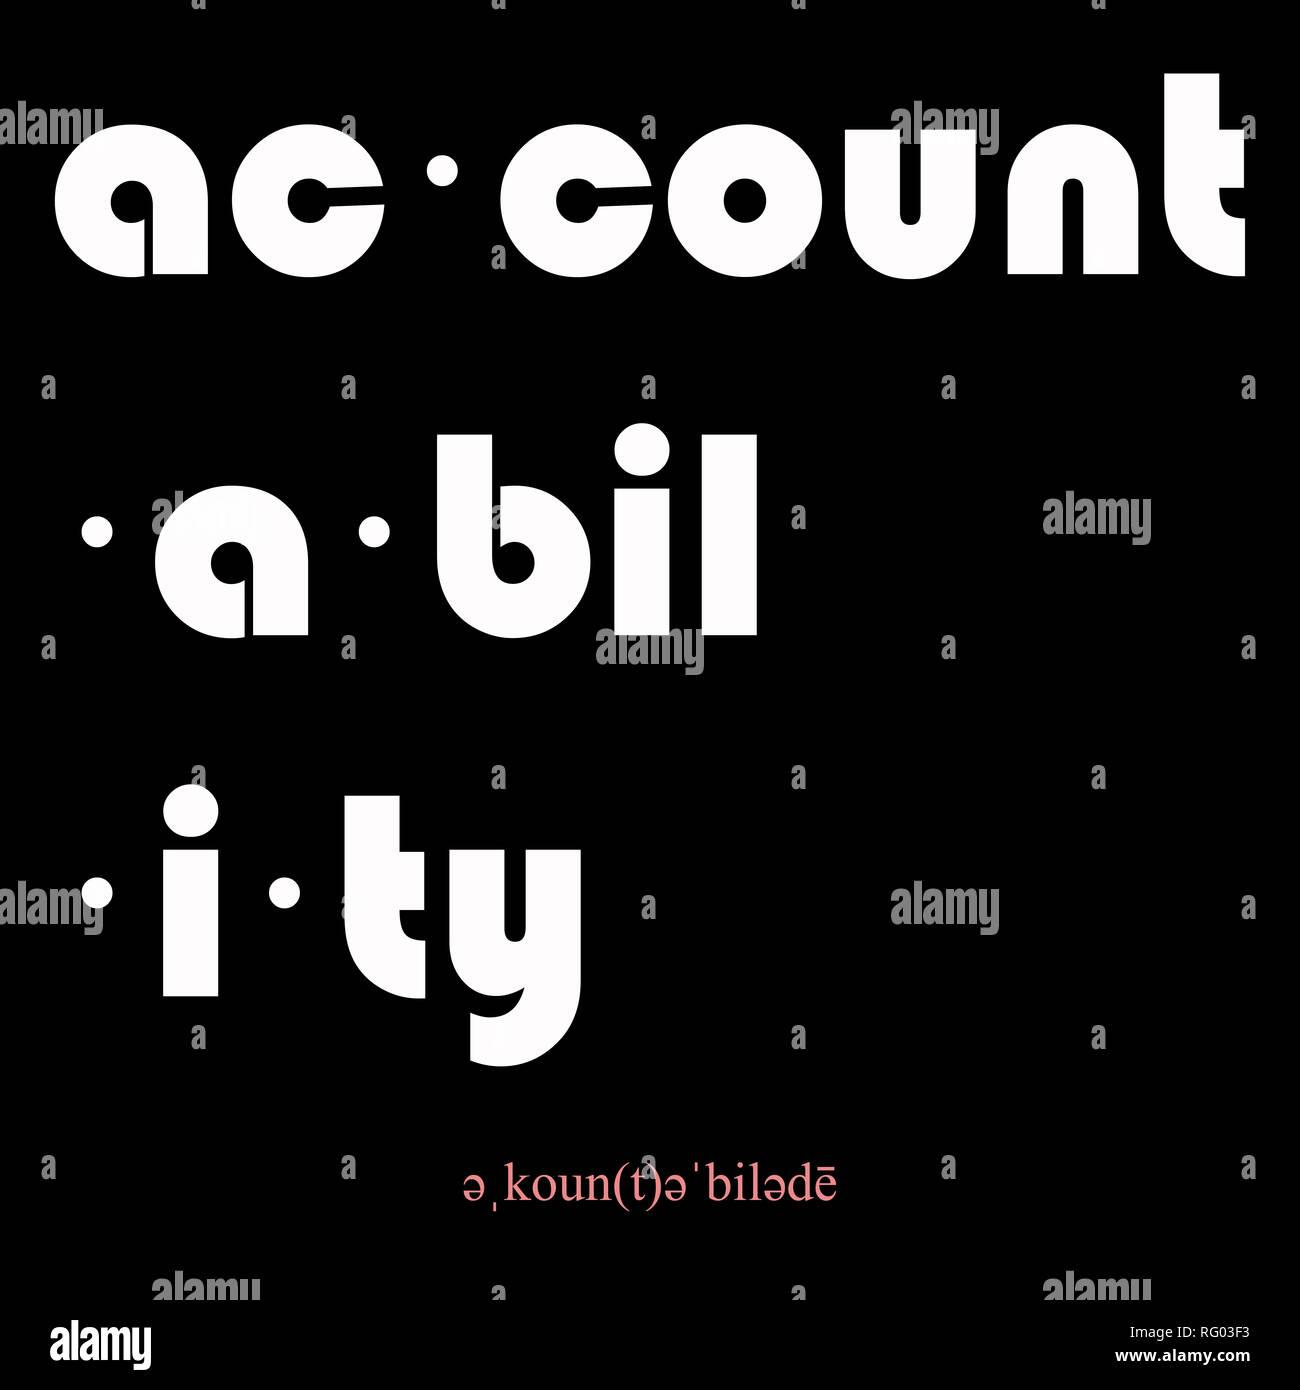 accountability accountability.jpg - RG03F3 - Stock Image